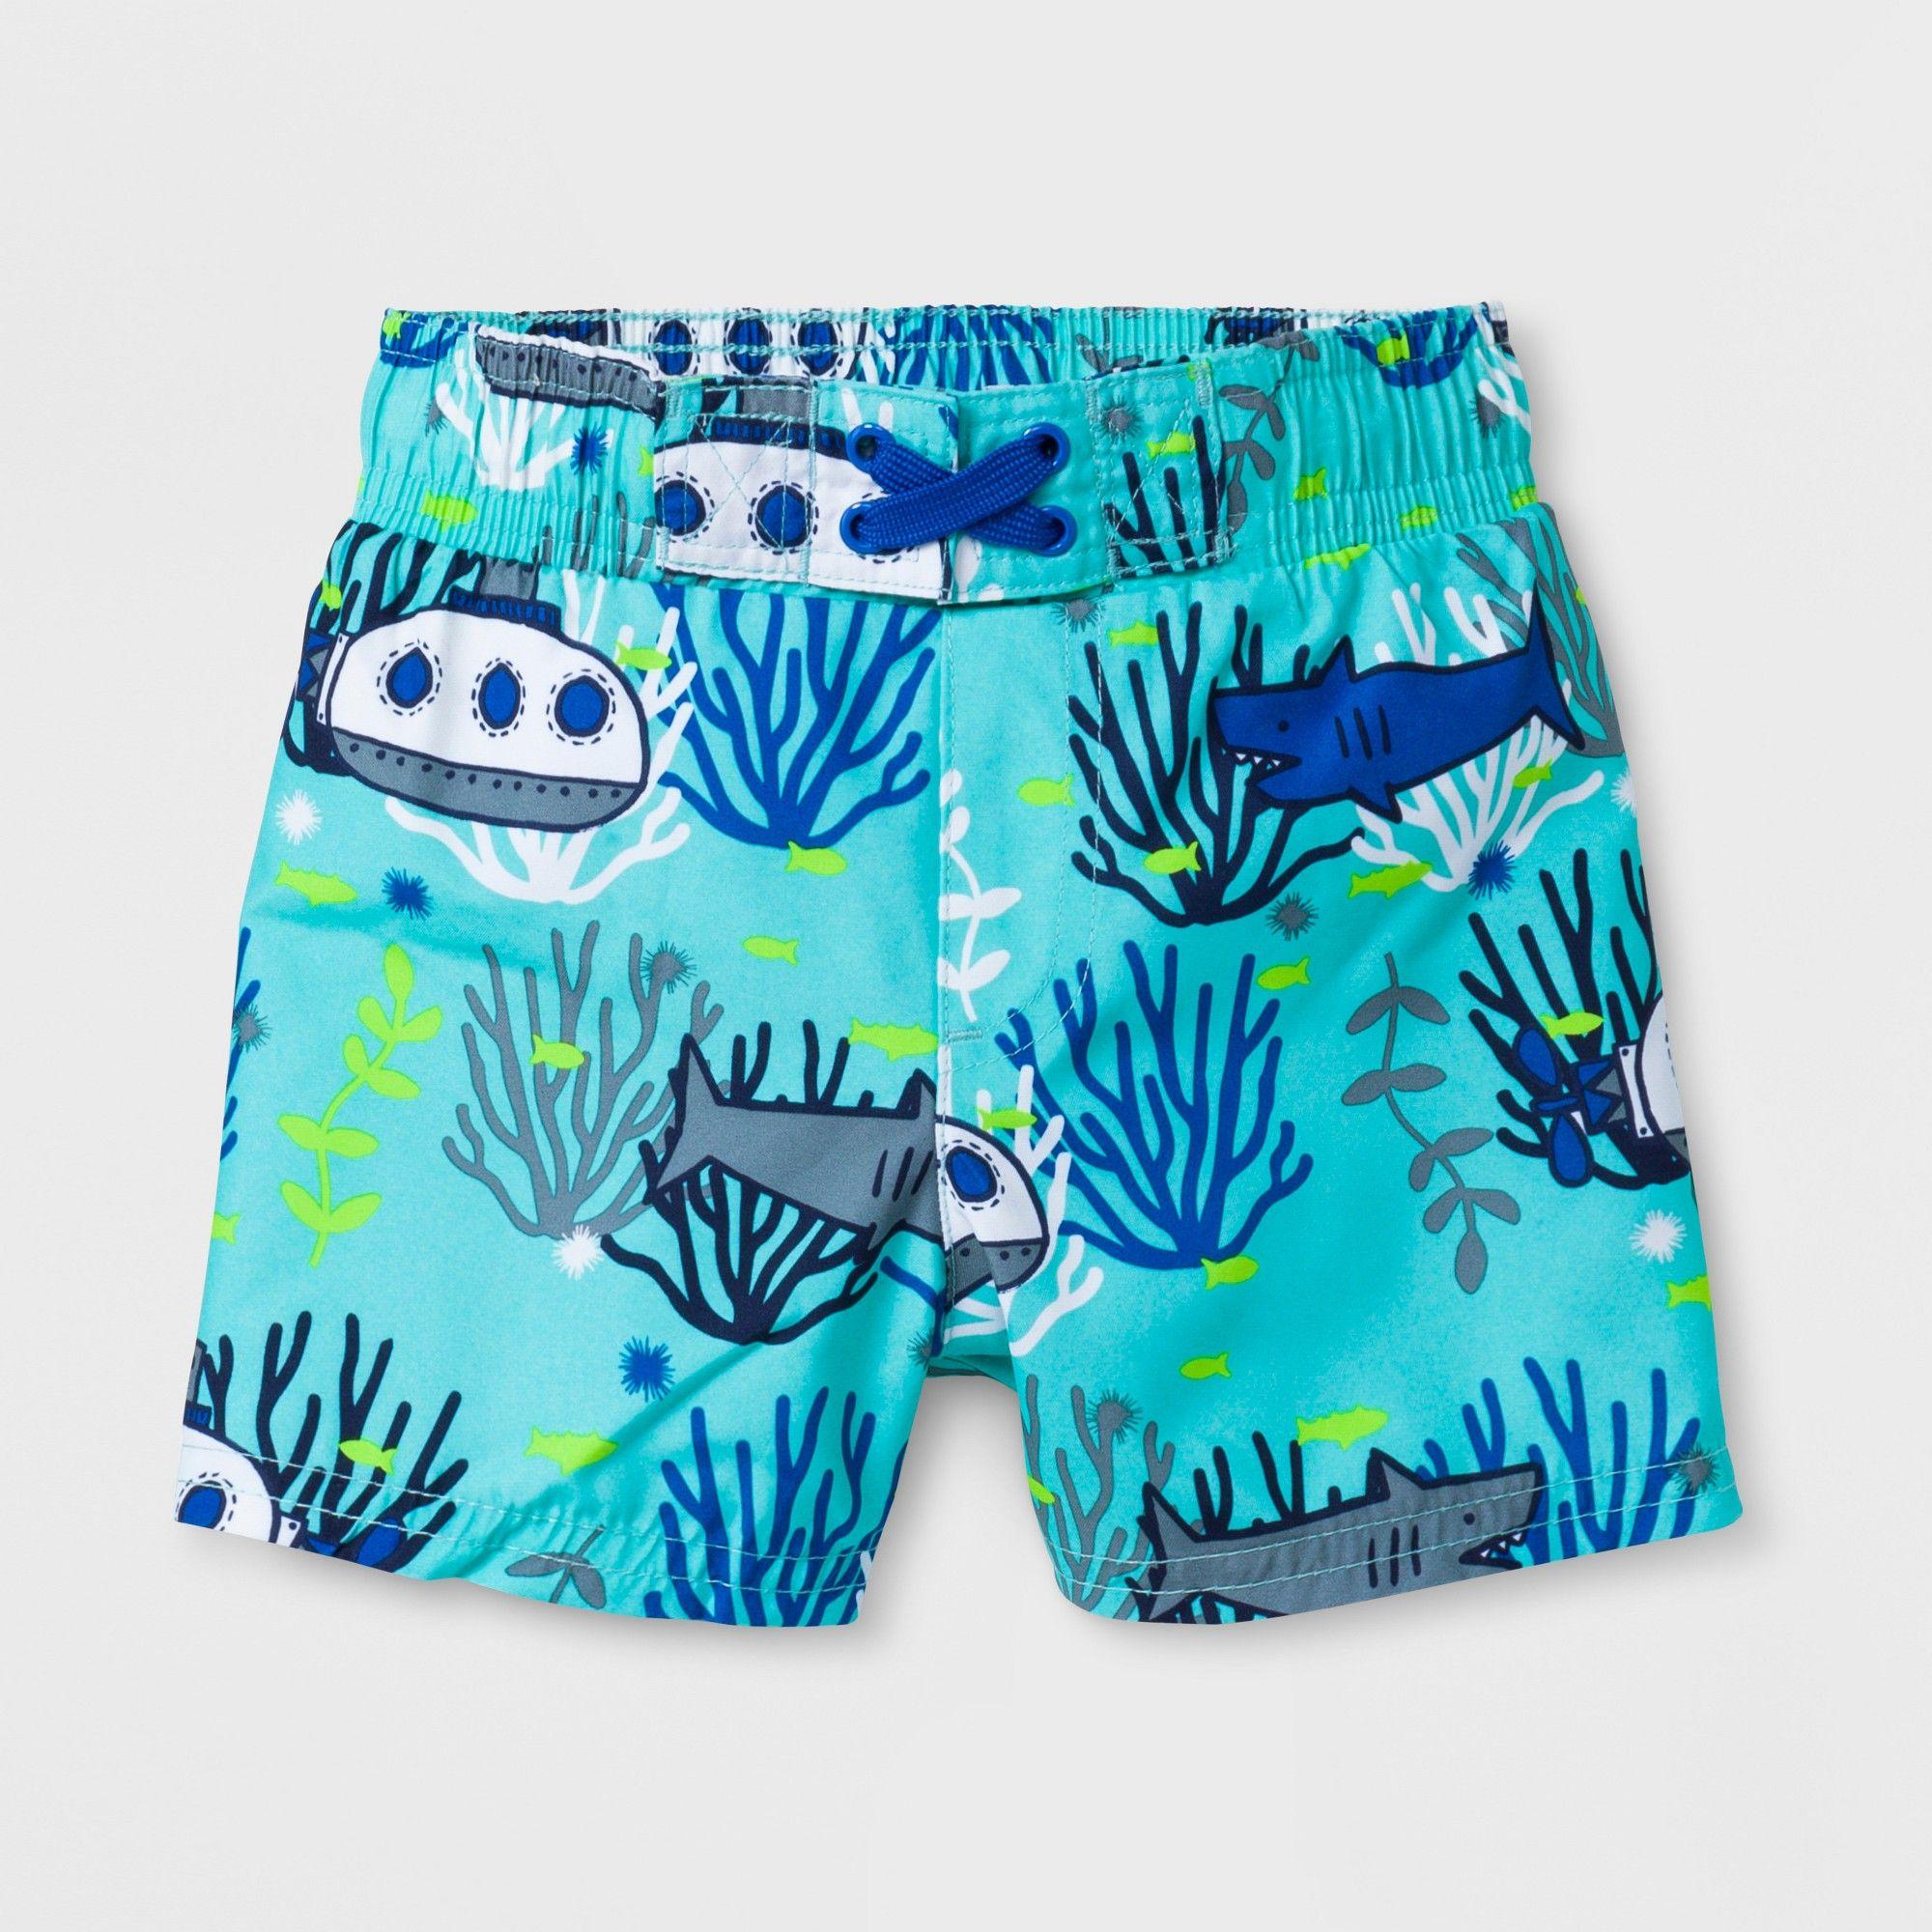 6b8928b89 Baby Boys' Submarine and Shark Swim Trunks - Cat & Jack Aqua 12M, Blue